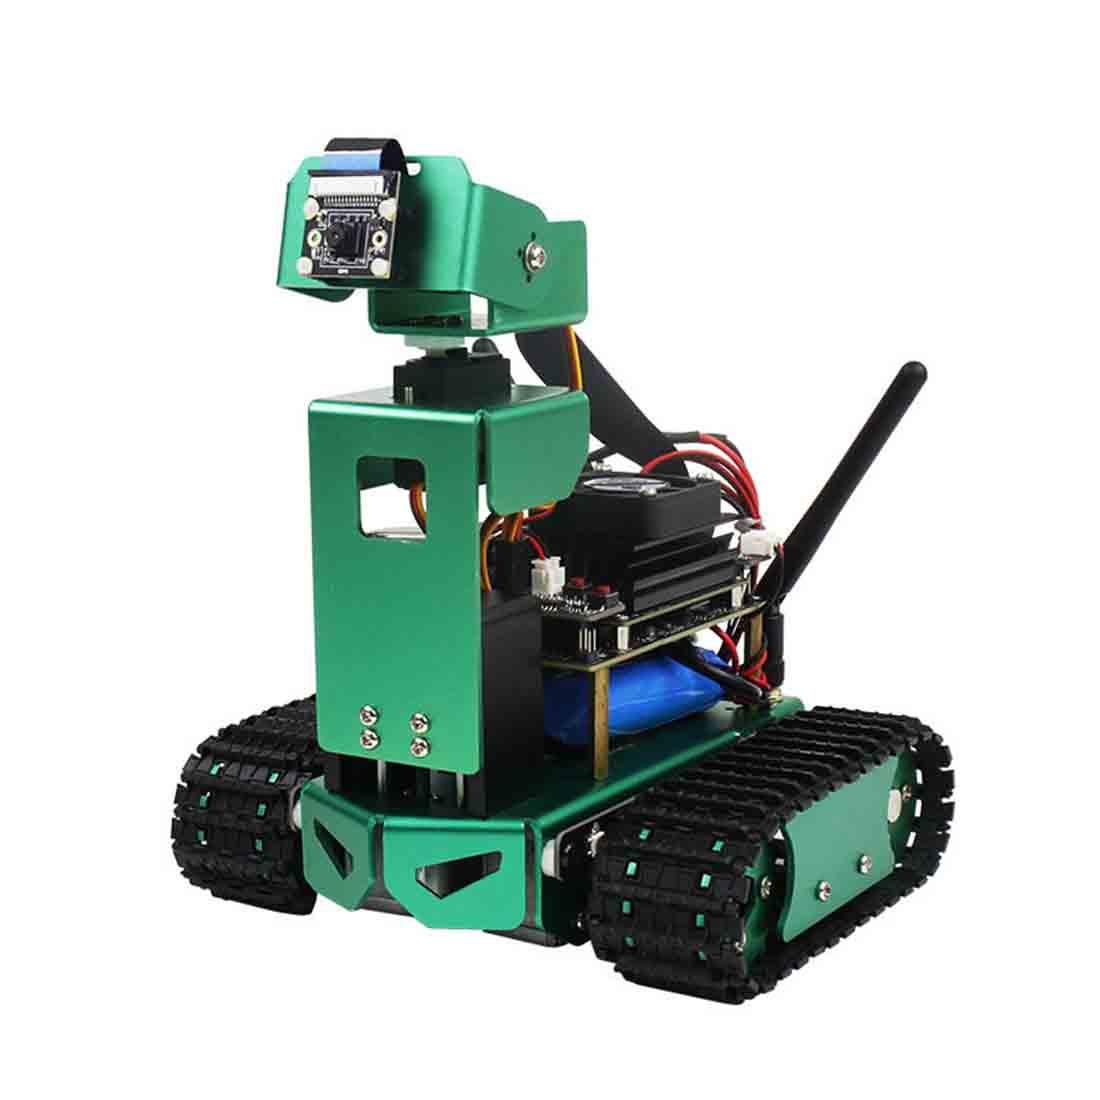 High Tech Artificial Programmable  Intelligence Car DIY 3DOF Robot Car Kit  Development Board For Jetson Nano Adjustable Height